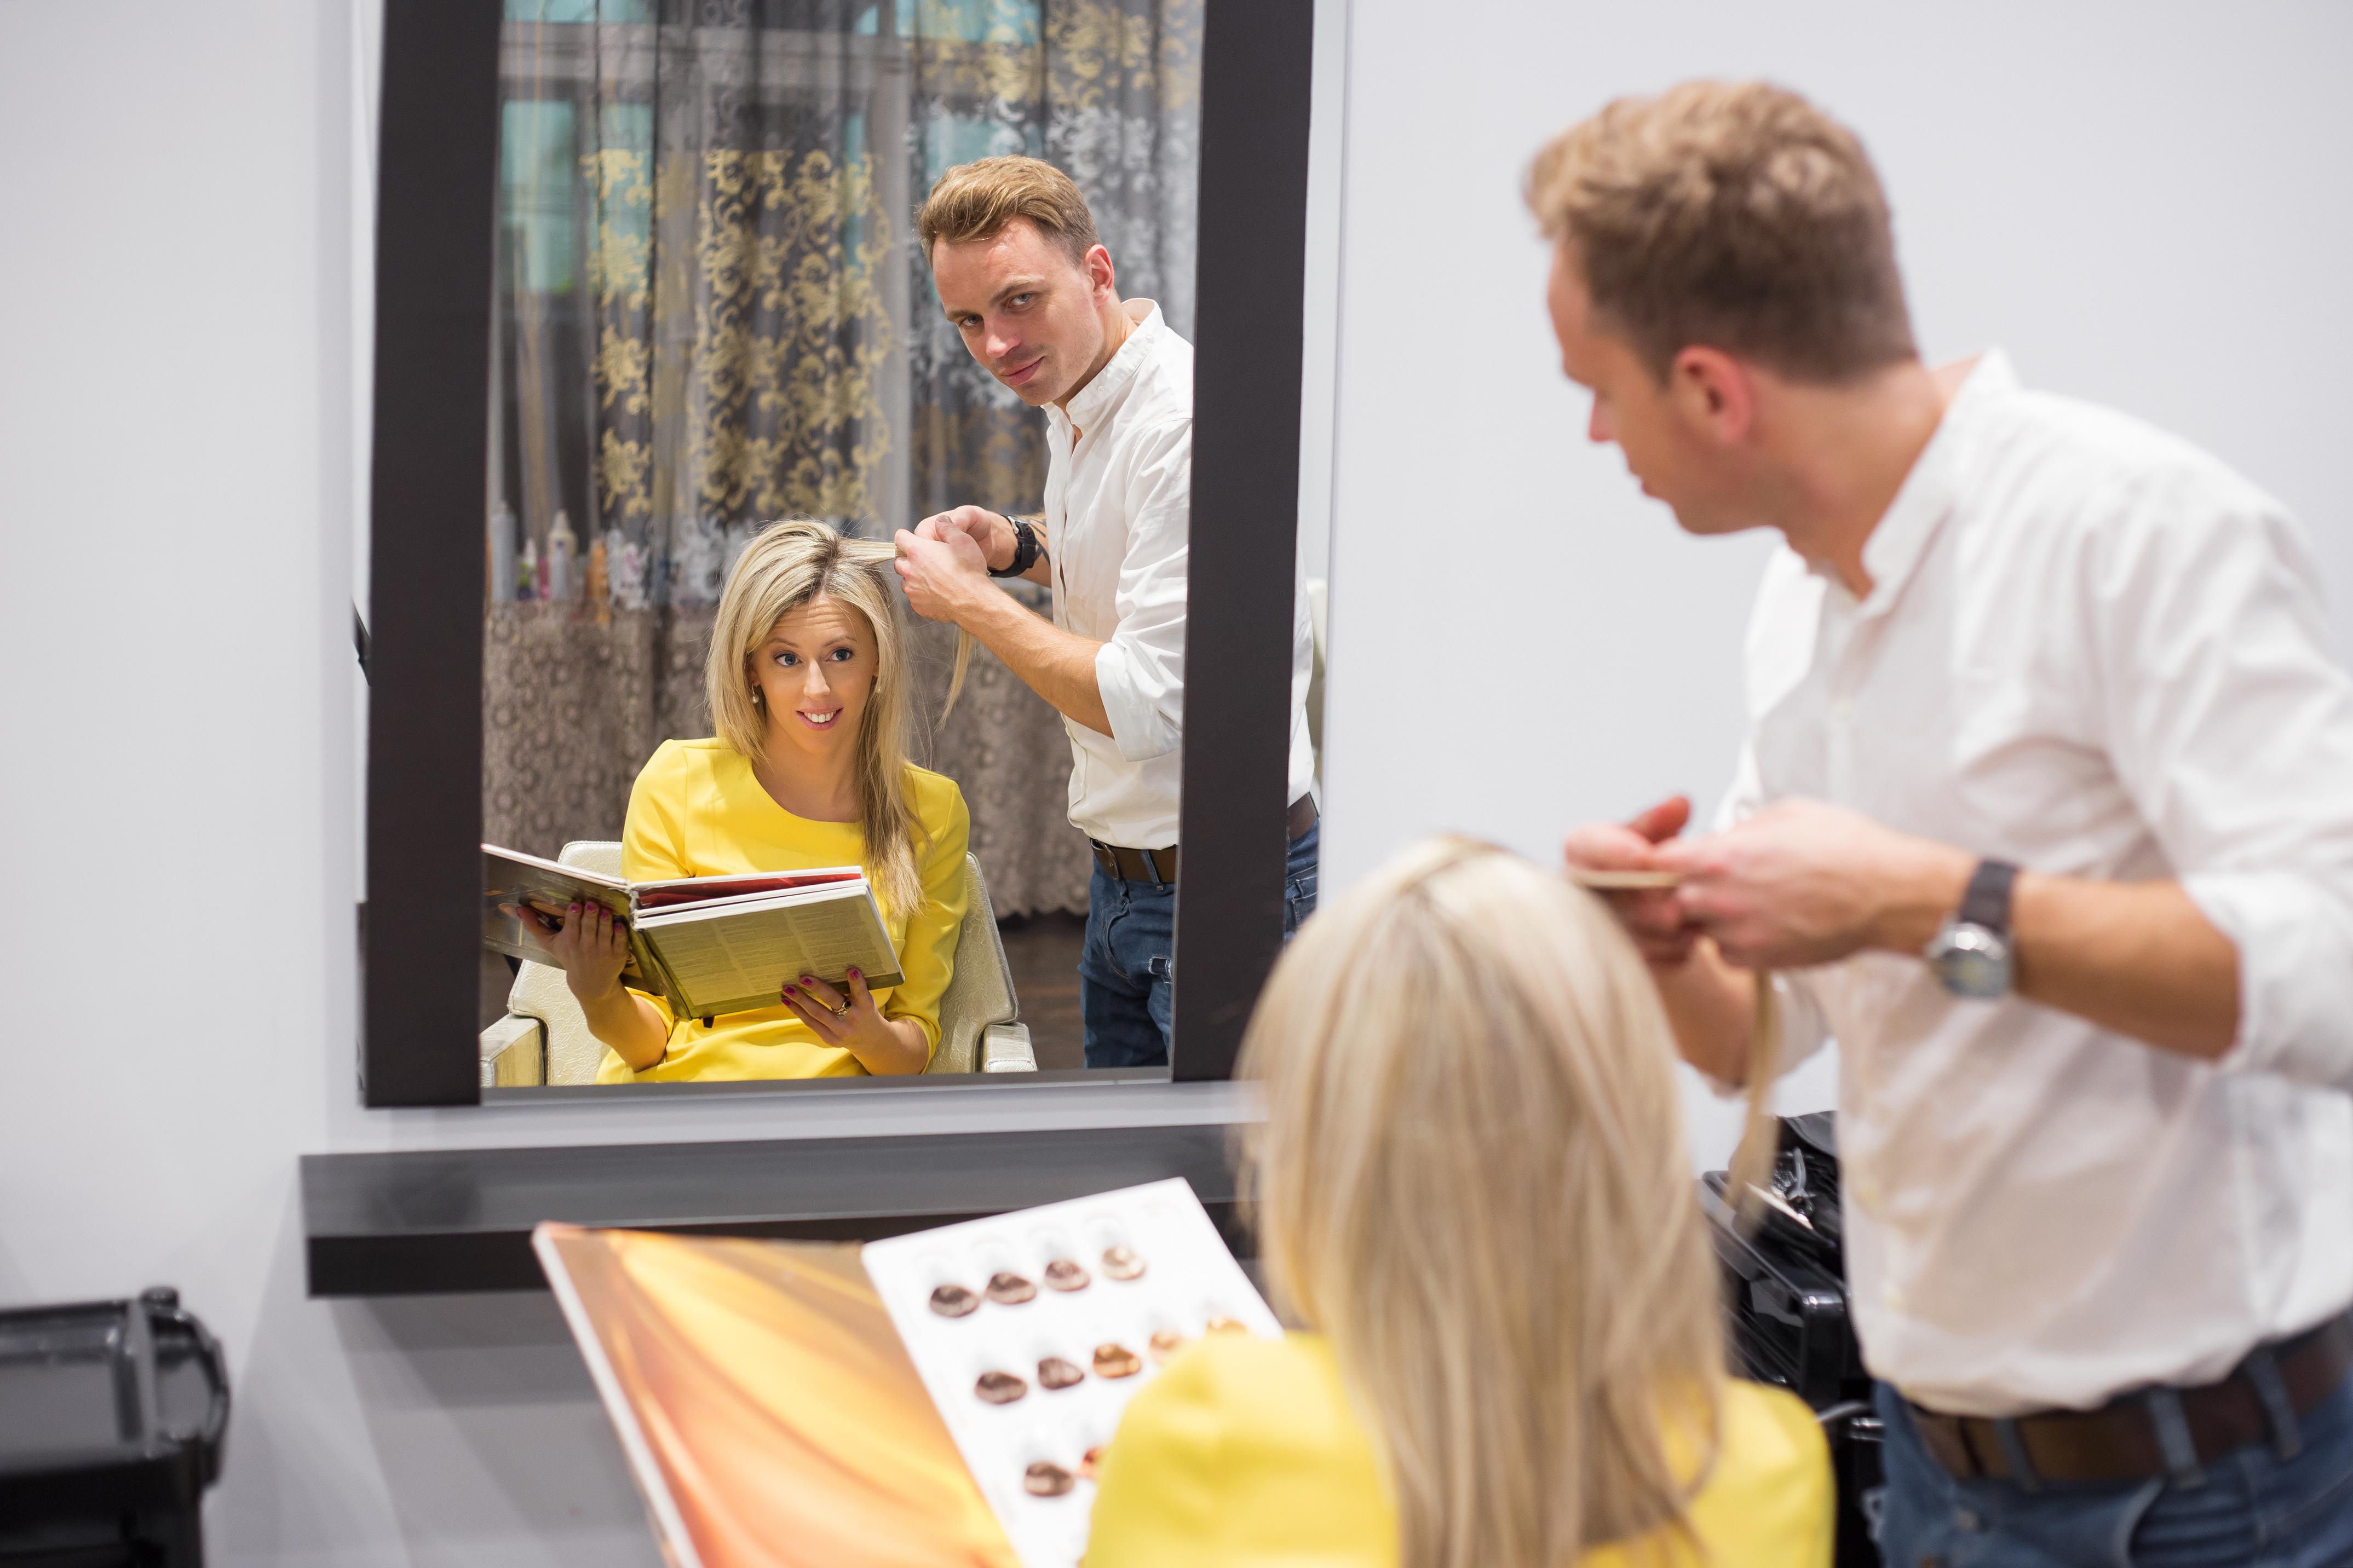 Gold coast hair salon for sale located in Chevron Island